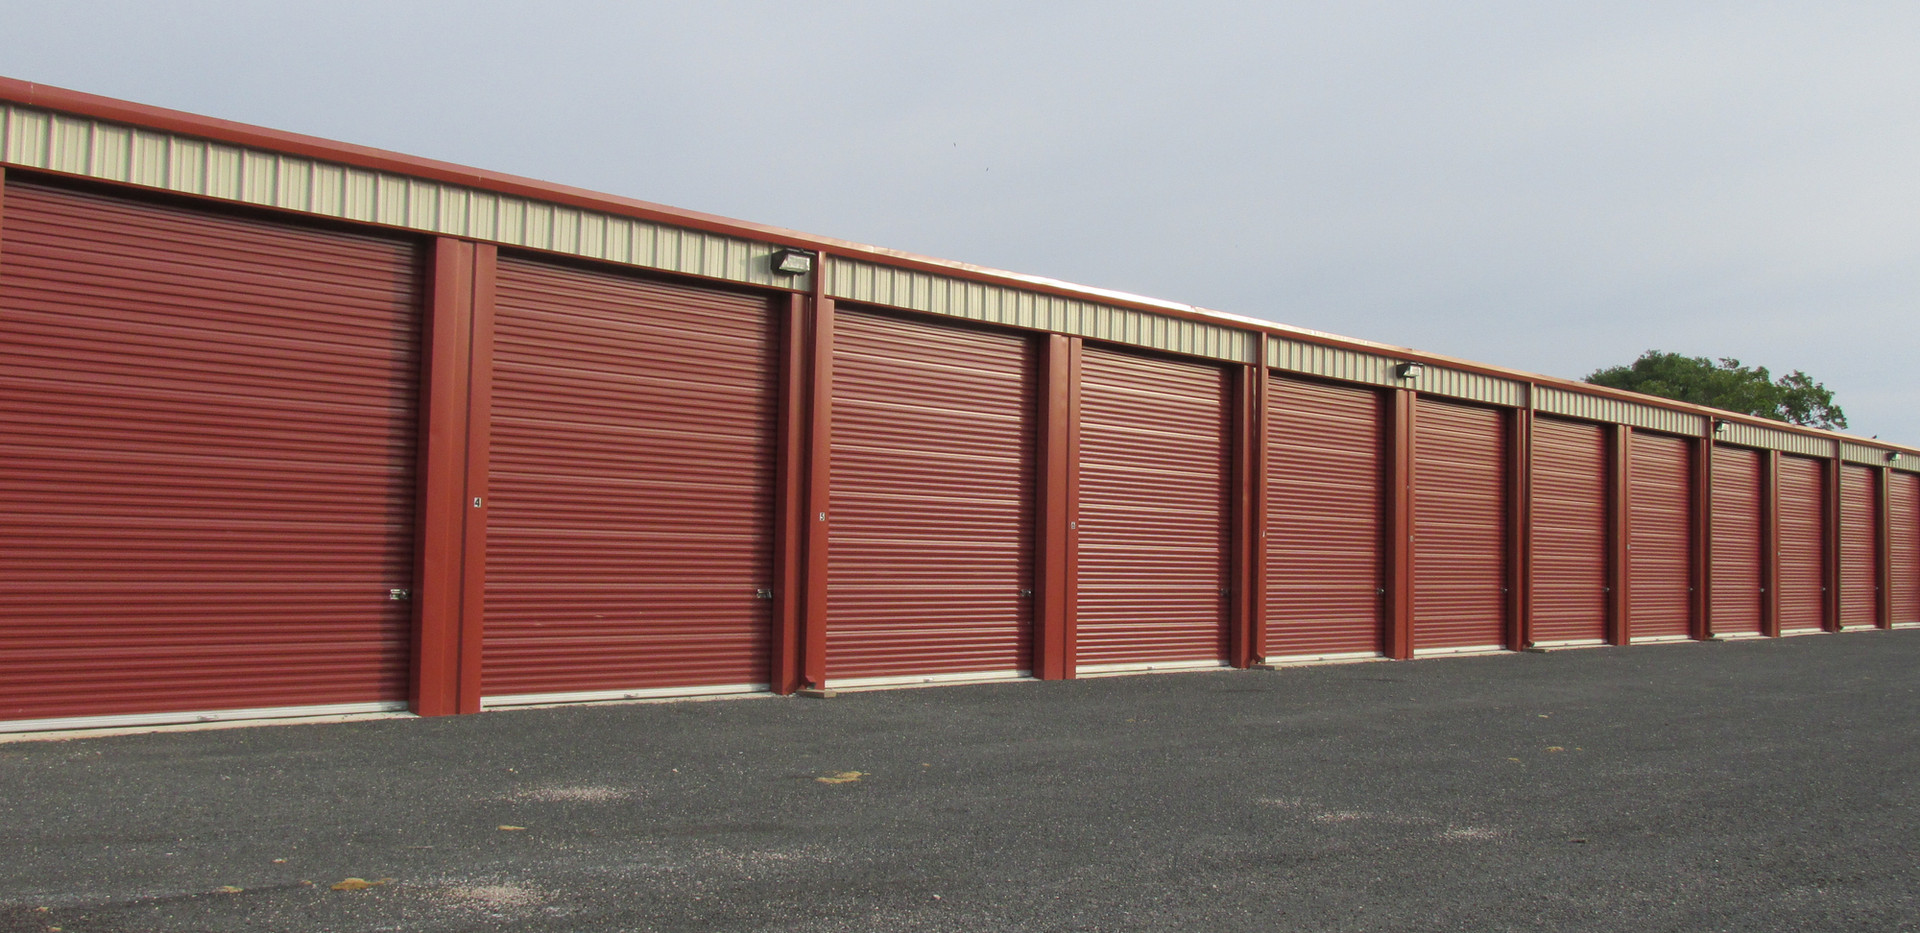 self-storage enclosed bldg. pic 3.JPG